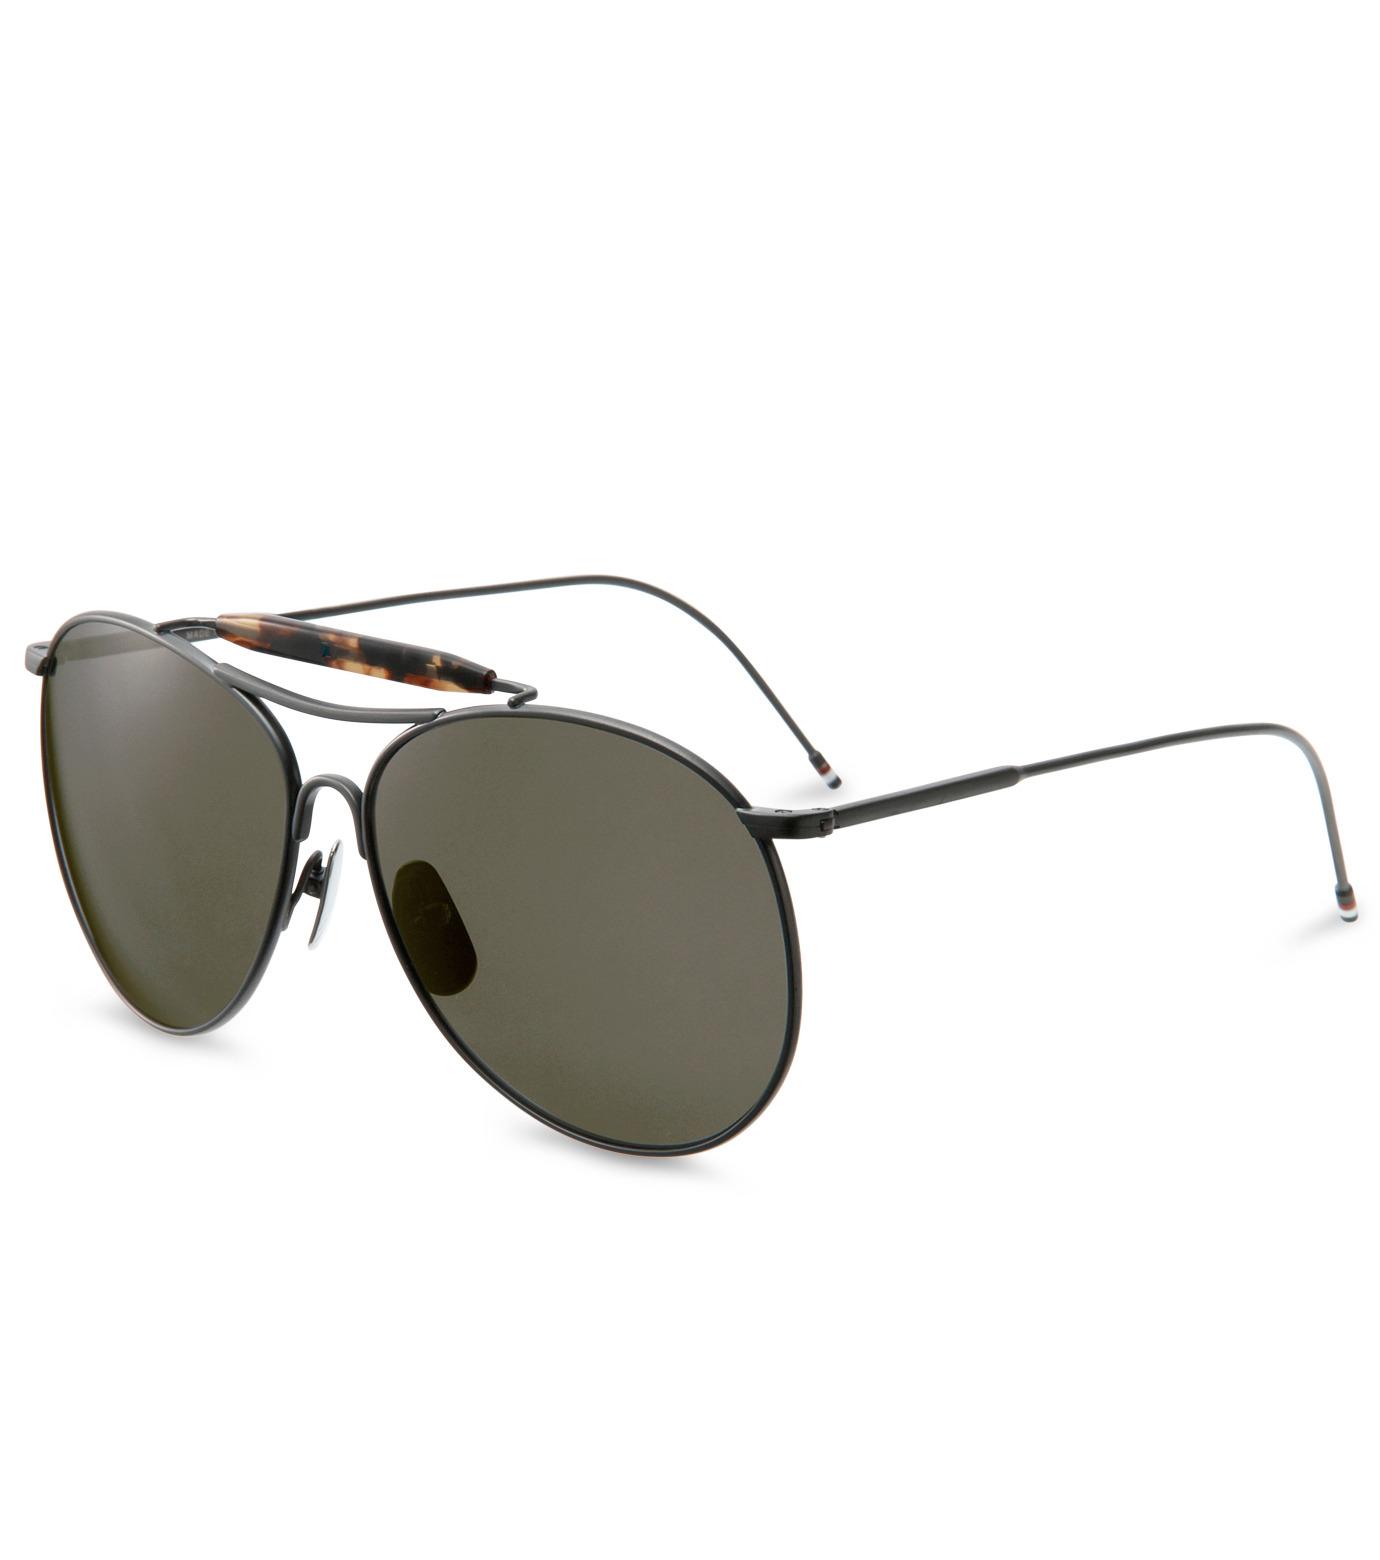 Thom Browne Eye Wear(トム・ブラウン・アイウェア)のBlack iron w-BLACK(アイウェア/eyewear)-TB-020C-T-59-13 拡大詳細画像1